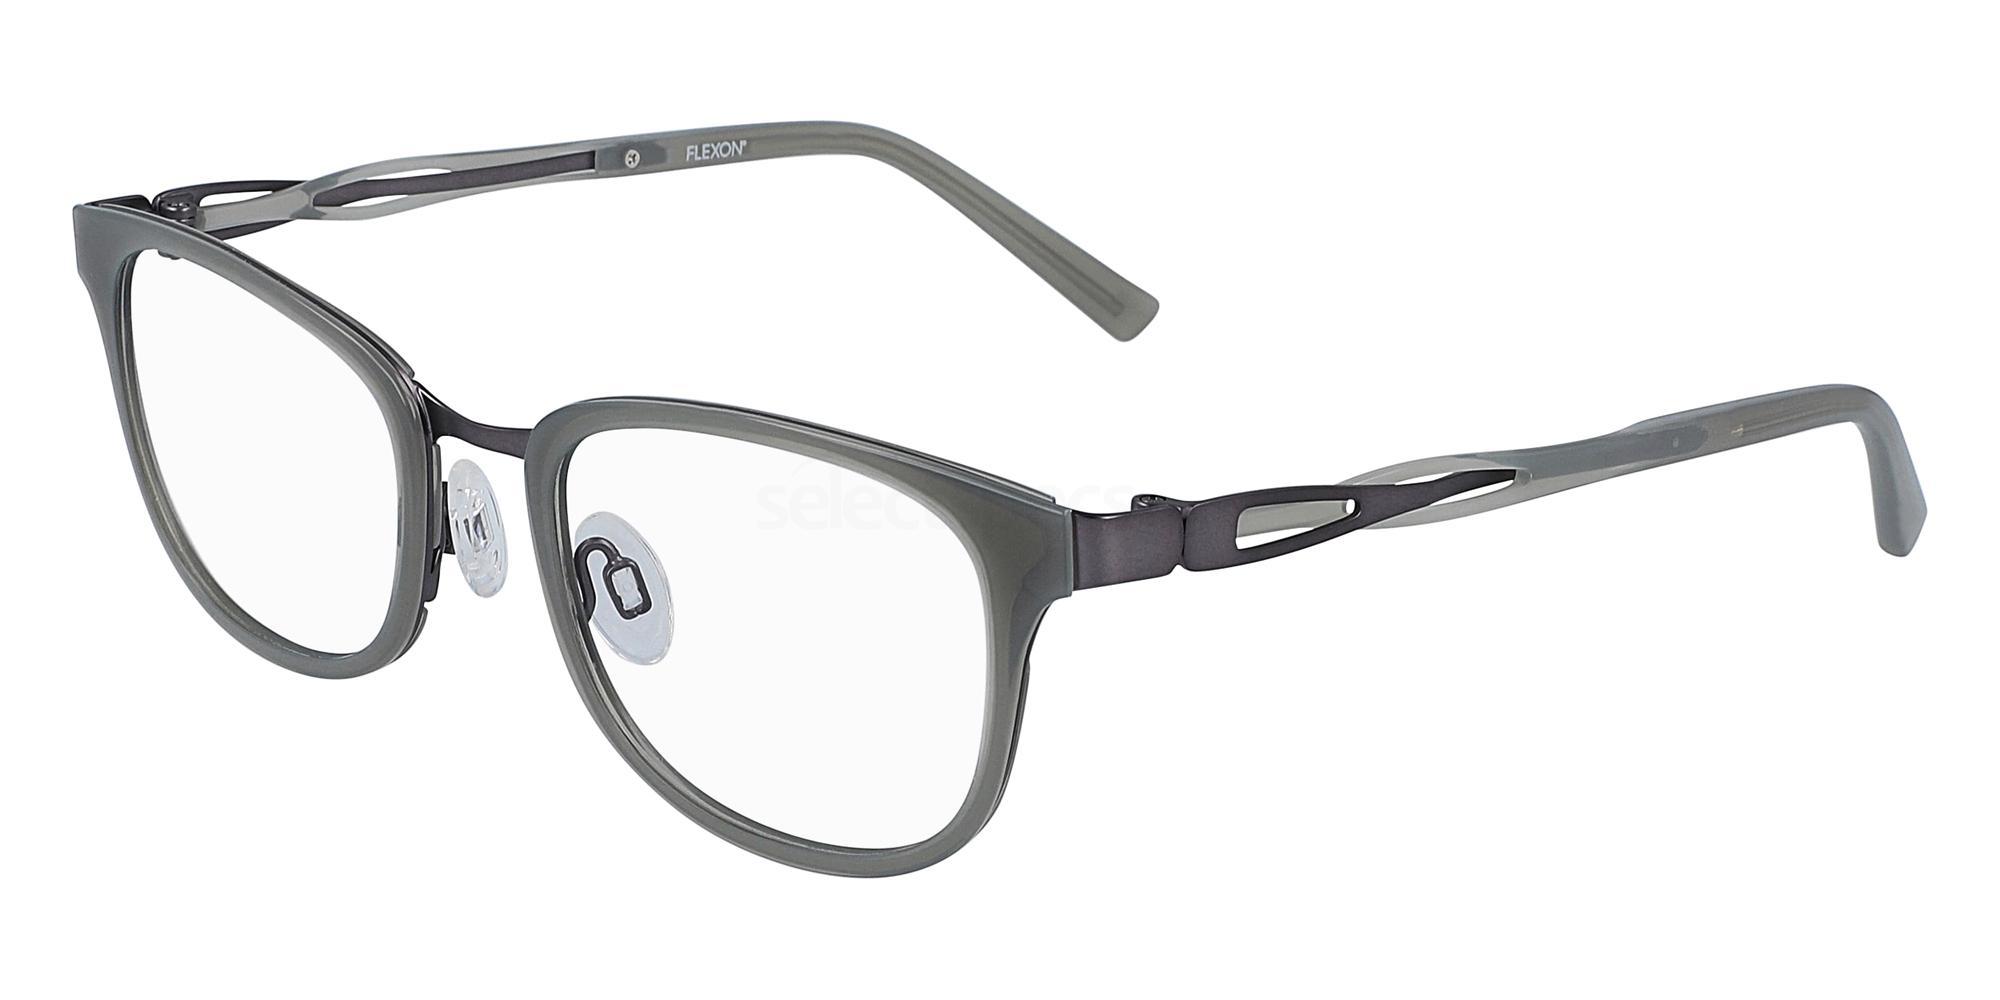 003 FLEXON W3010 Glasses, Flexon